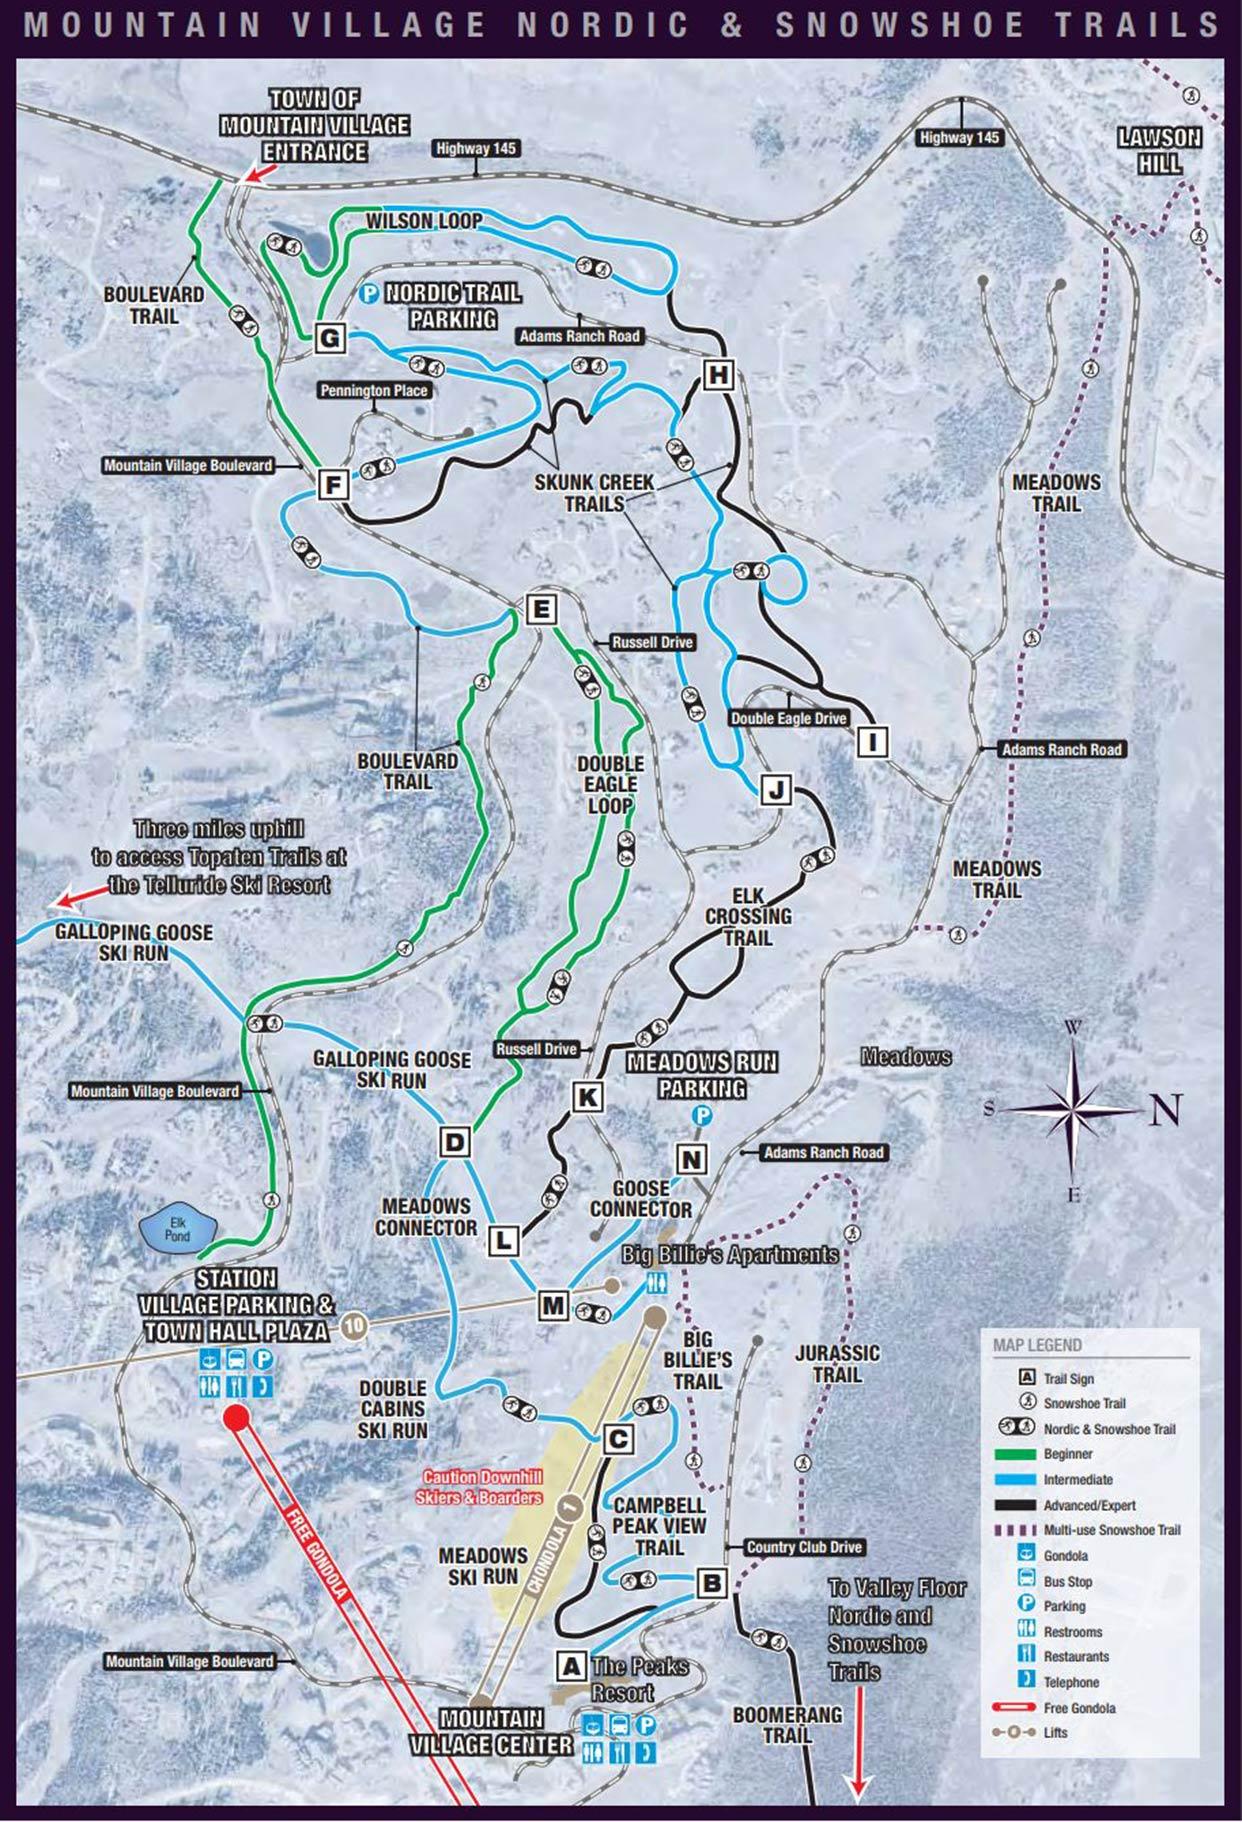 TOMV Nordic & Snowshoe Trail Map